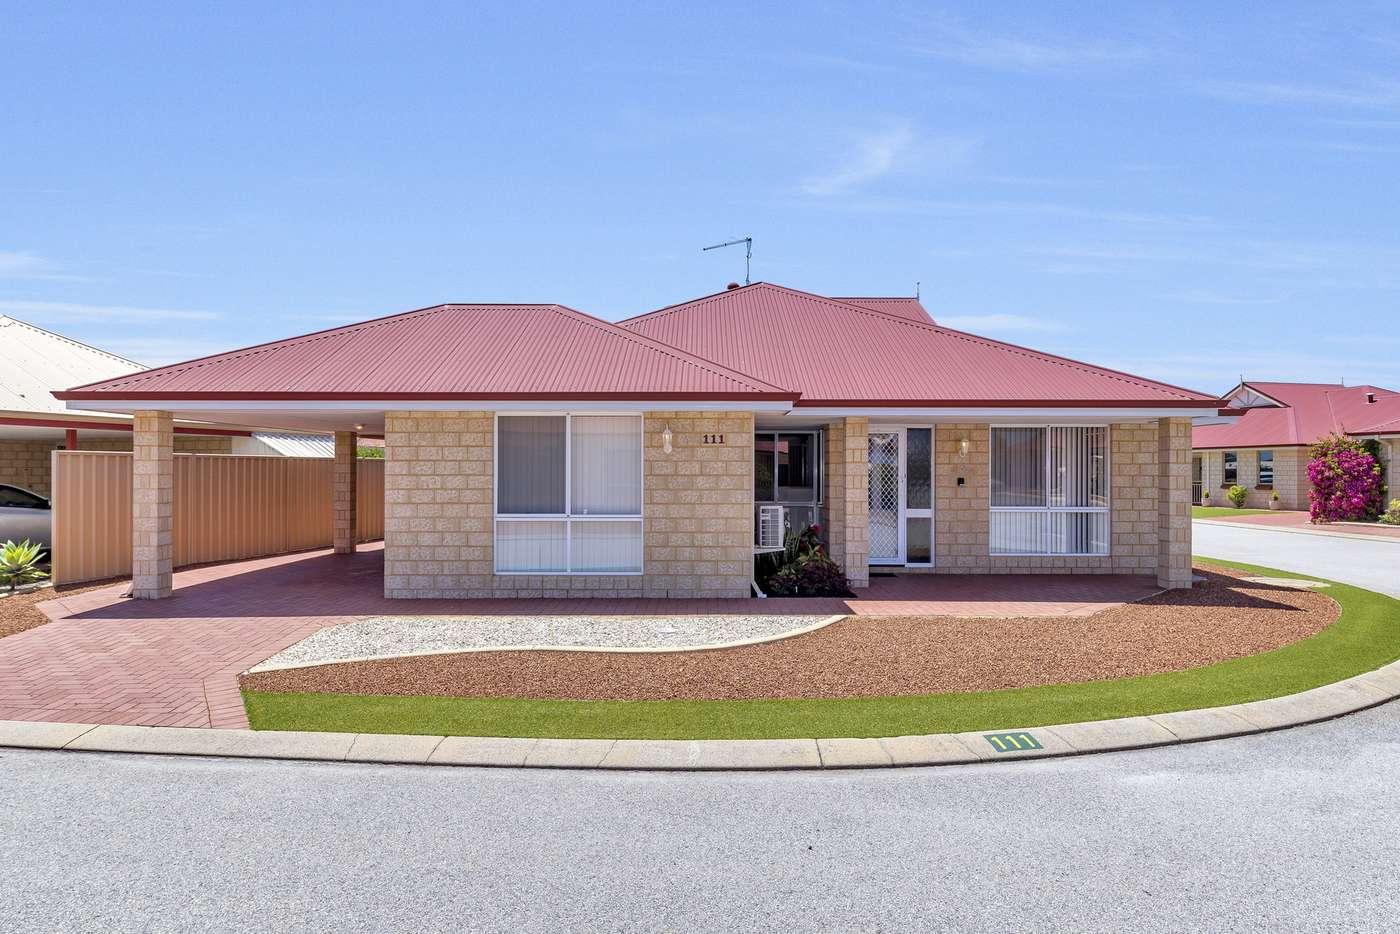 Main view of Homely retirement listing, 111/194 Old Mandurah Road, Ravenswood WA 6208